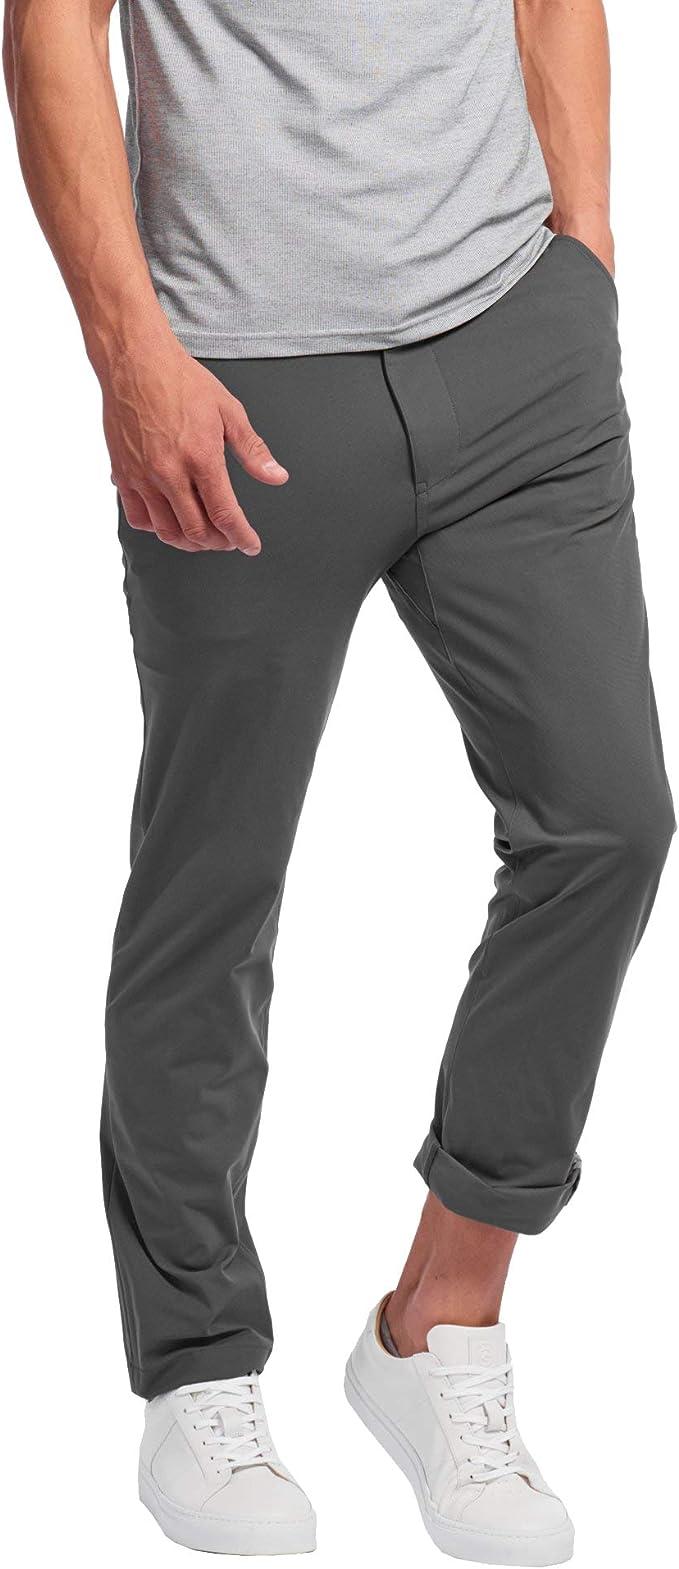 Rhone Men S City Pant 36 Inseam Straight Leg Flat Front Pants Pocket Reflector Asphalt 41 At Amazon Men S Clothing Store